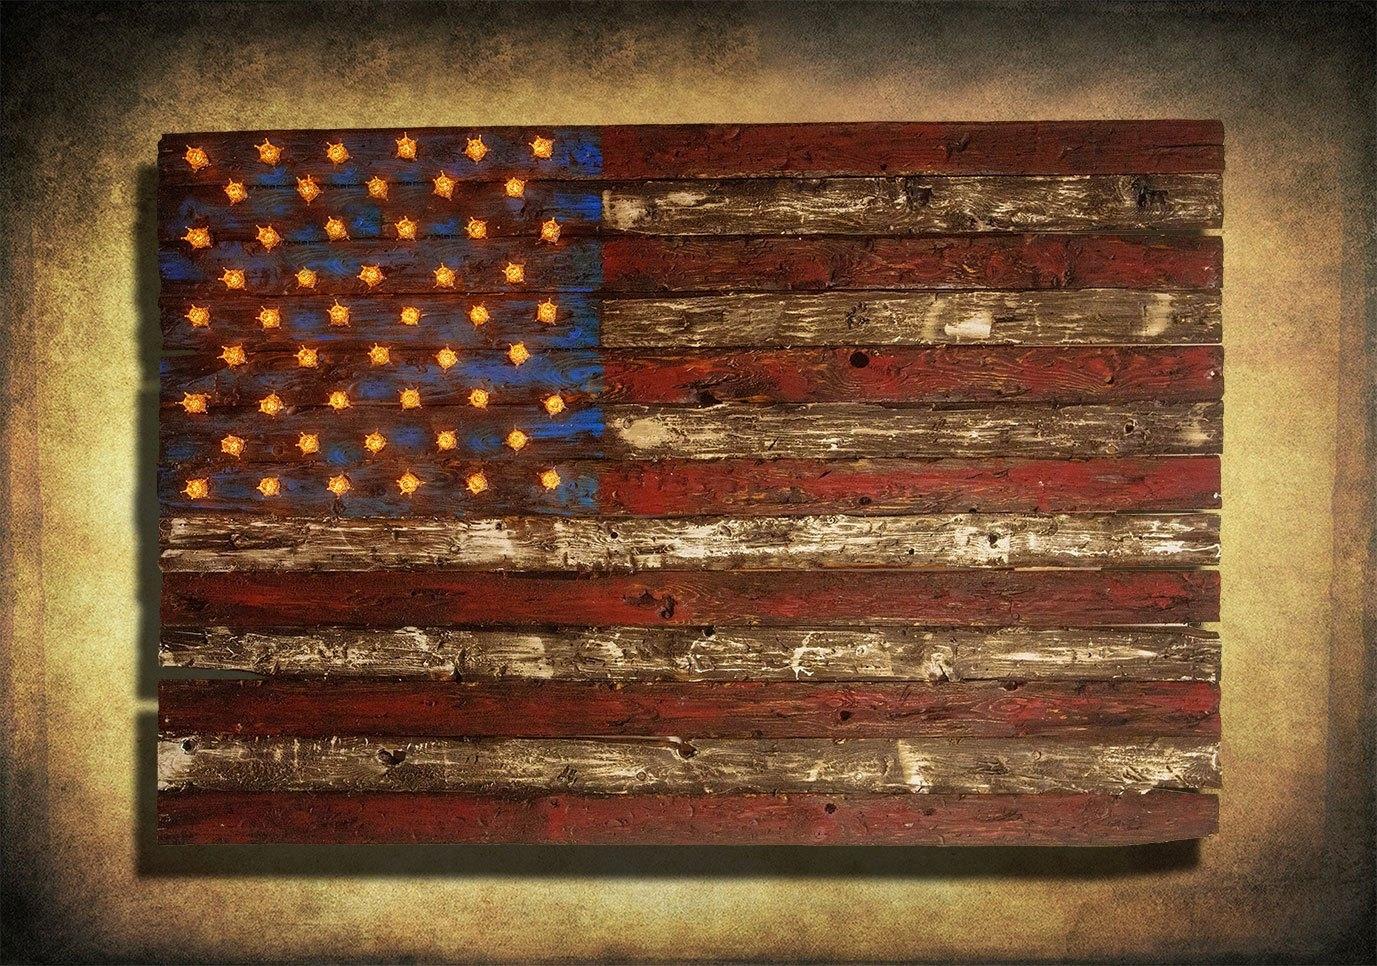 Flagrant Vintage American Flag Vintage American Flag Honeybuns Cloth pertaining to Vintage American Flag Wall Art (Image 9 of 20)